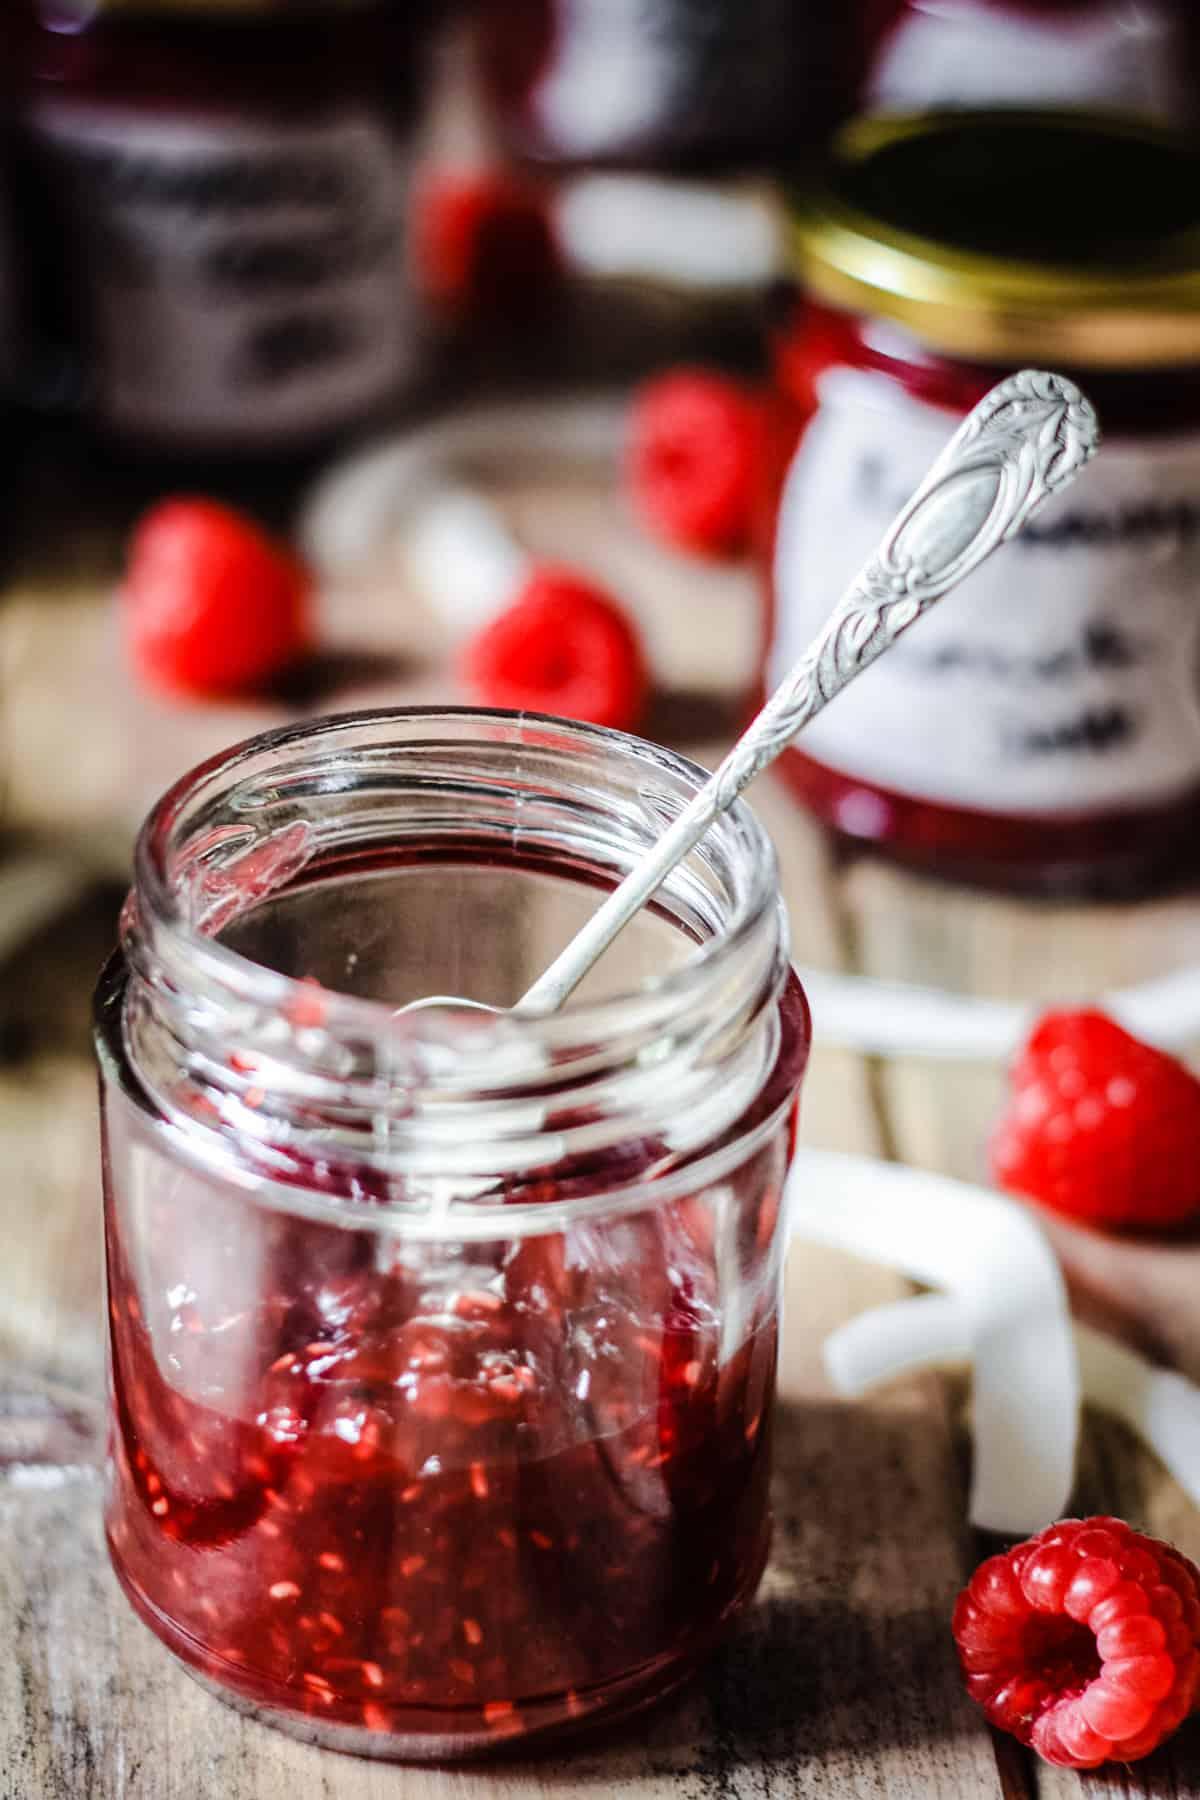 A jar of Raspberry Coconut Jam with a spoon